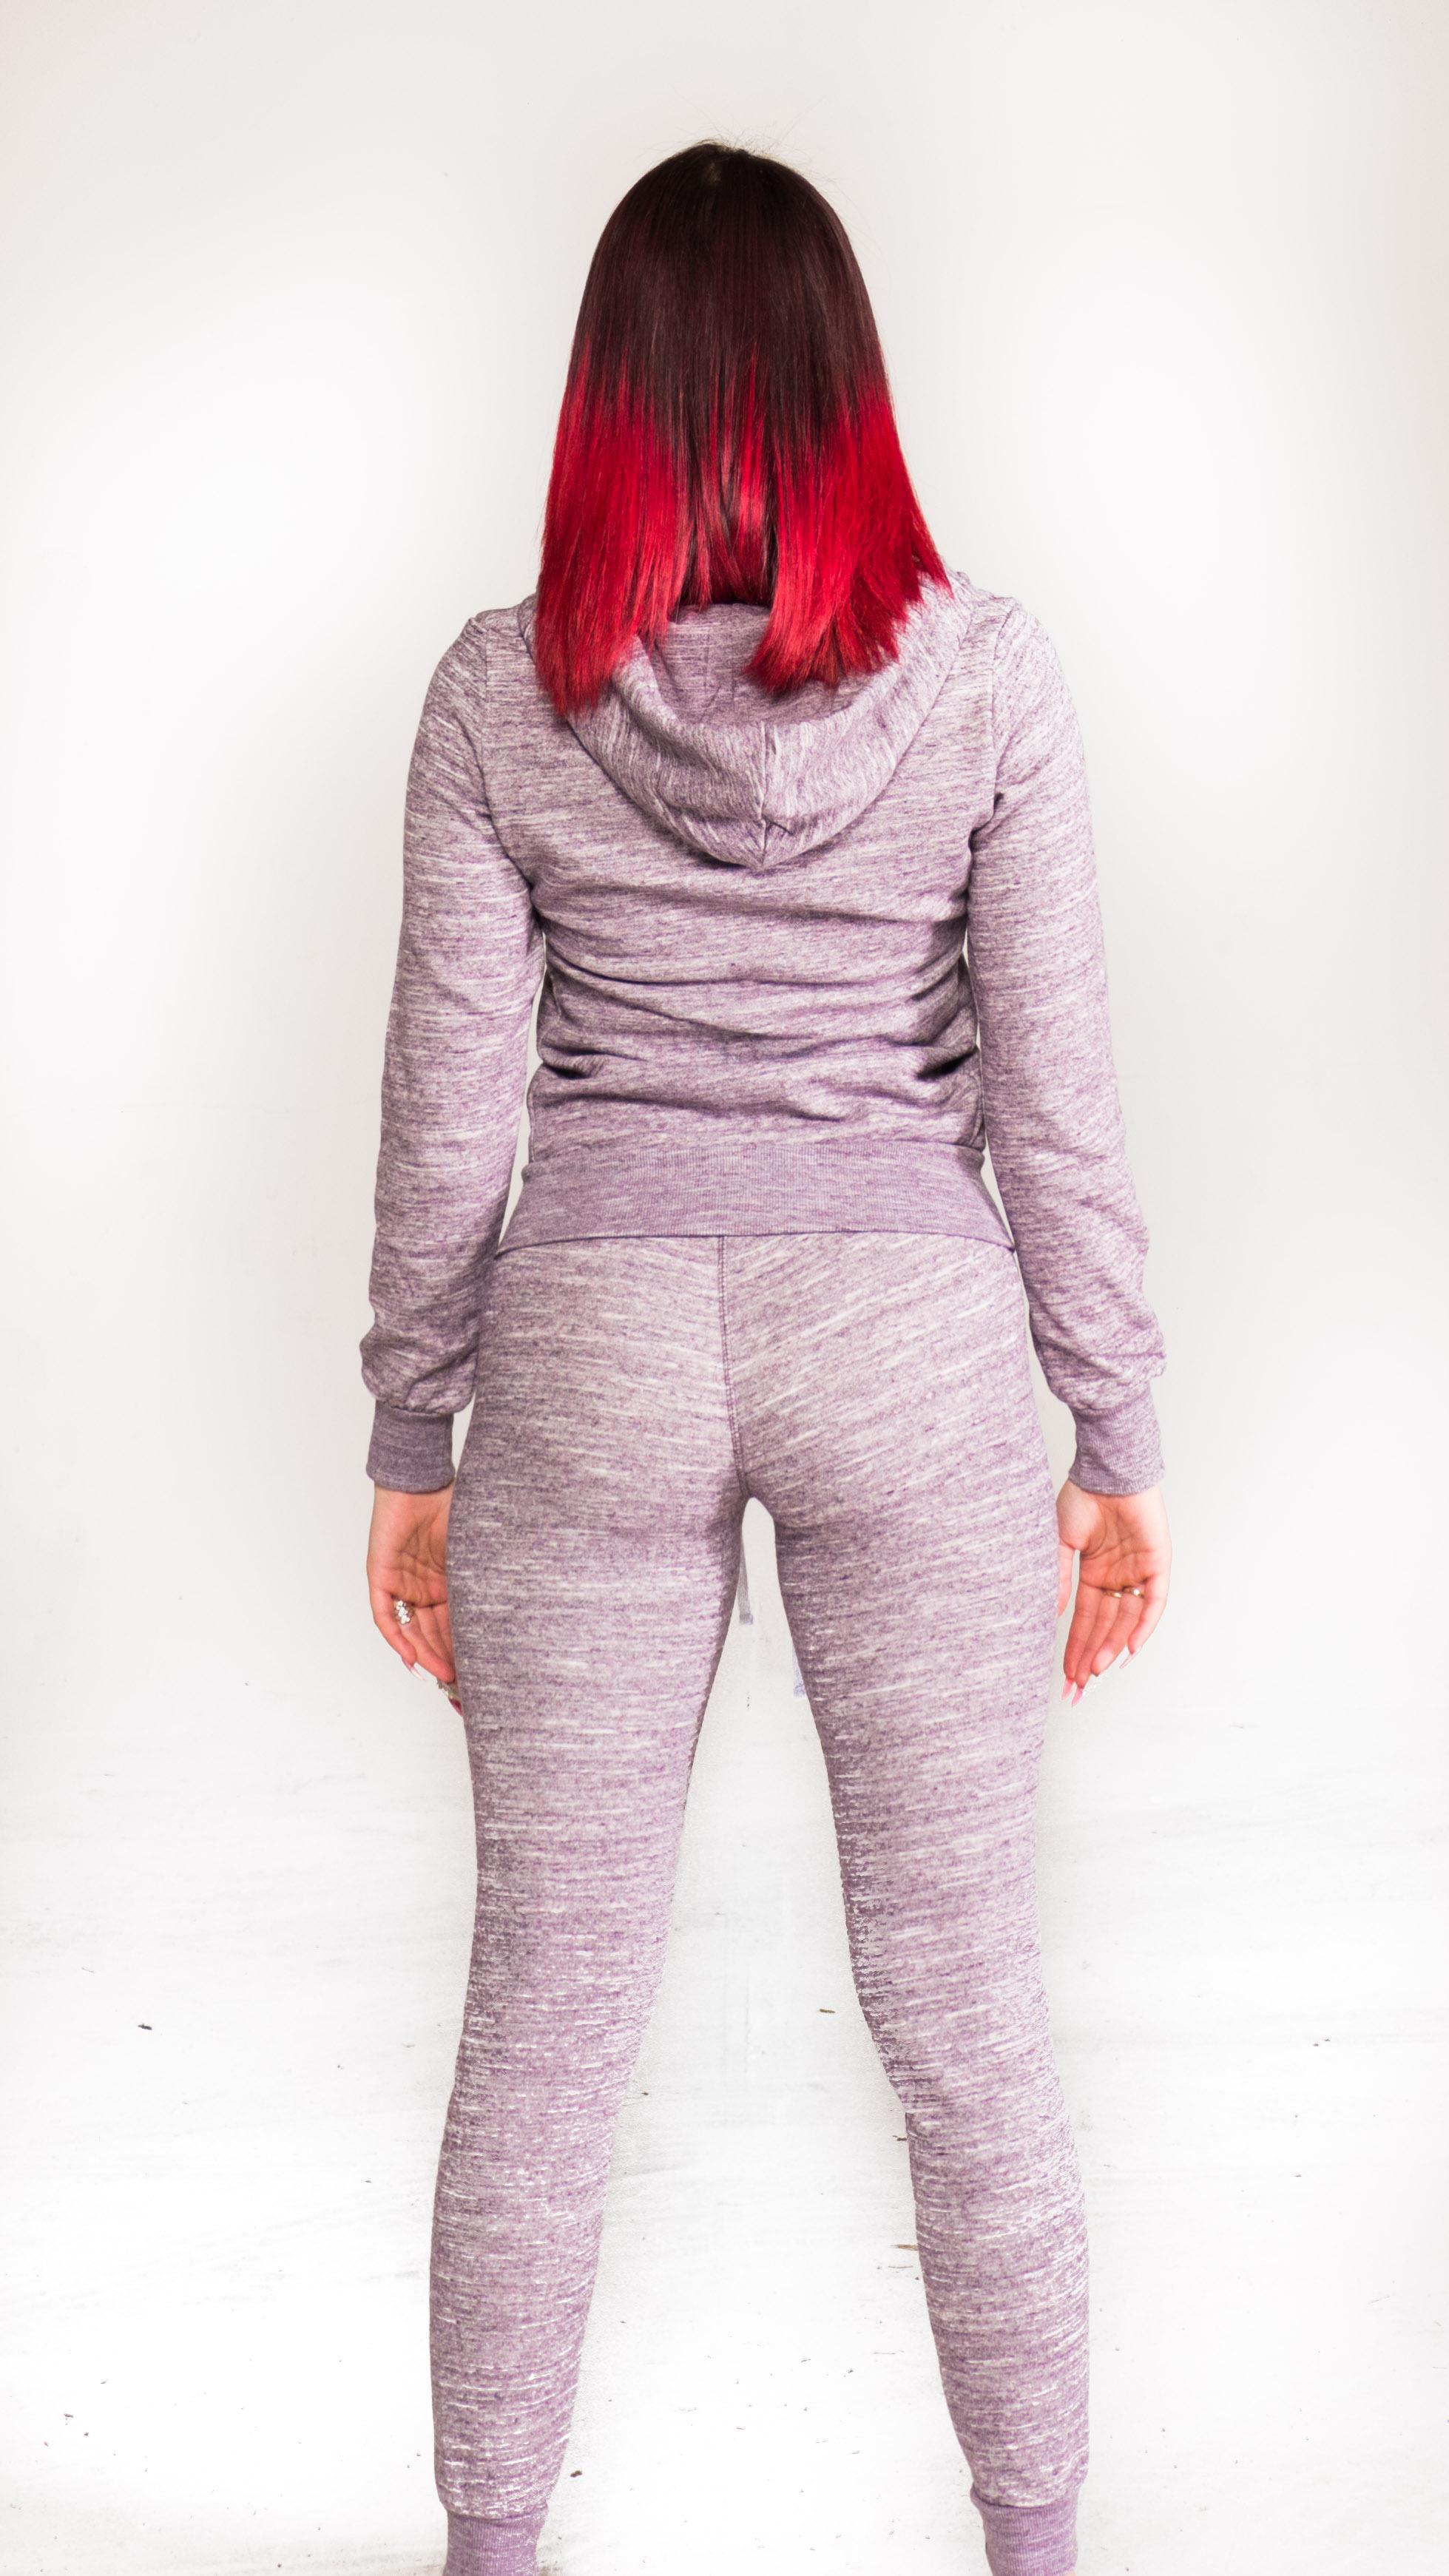 isis clothing - product shots-1580518.jpg